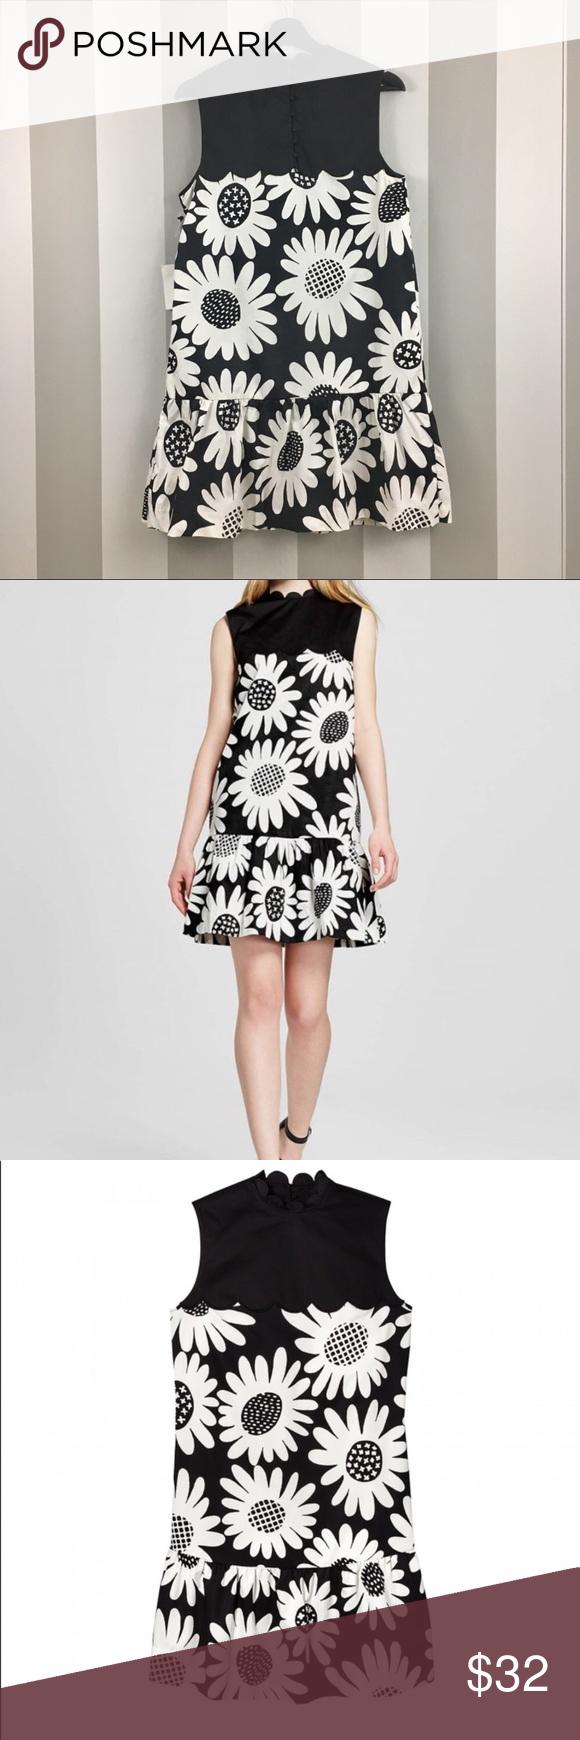 Victoria Beckman For Target Nwt Floral Dress M Floral Dress Scalloped Trim Dress Target Dresses [ 1740 x 580 Pixel ]